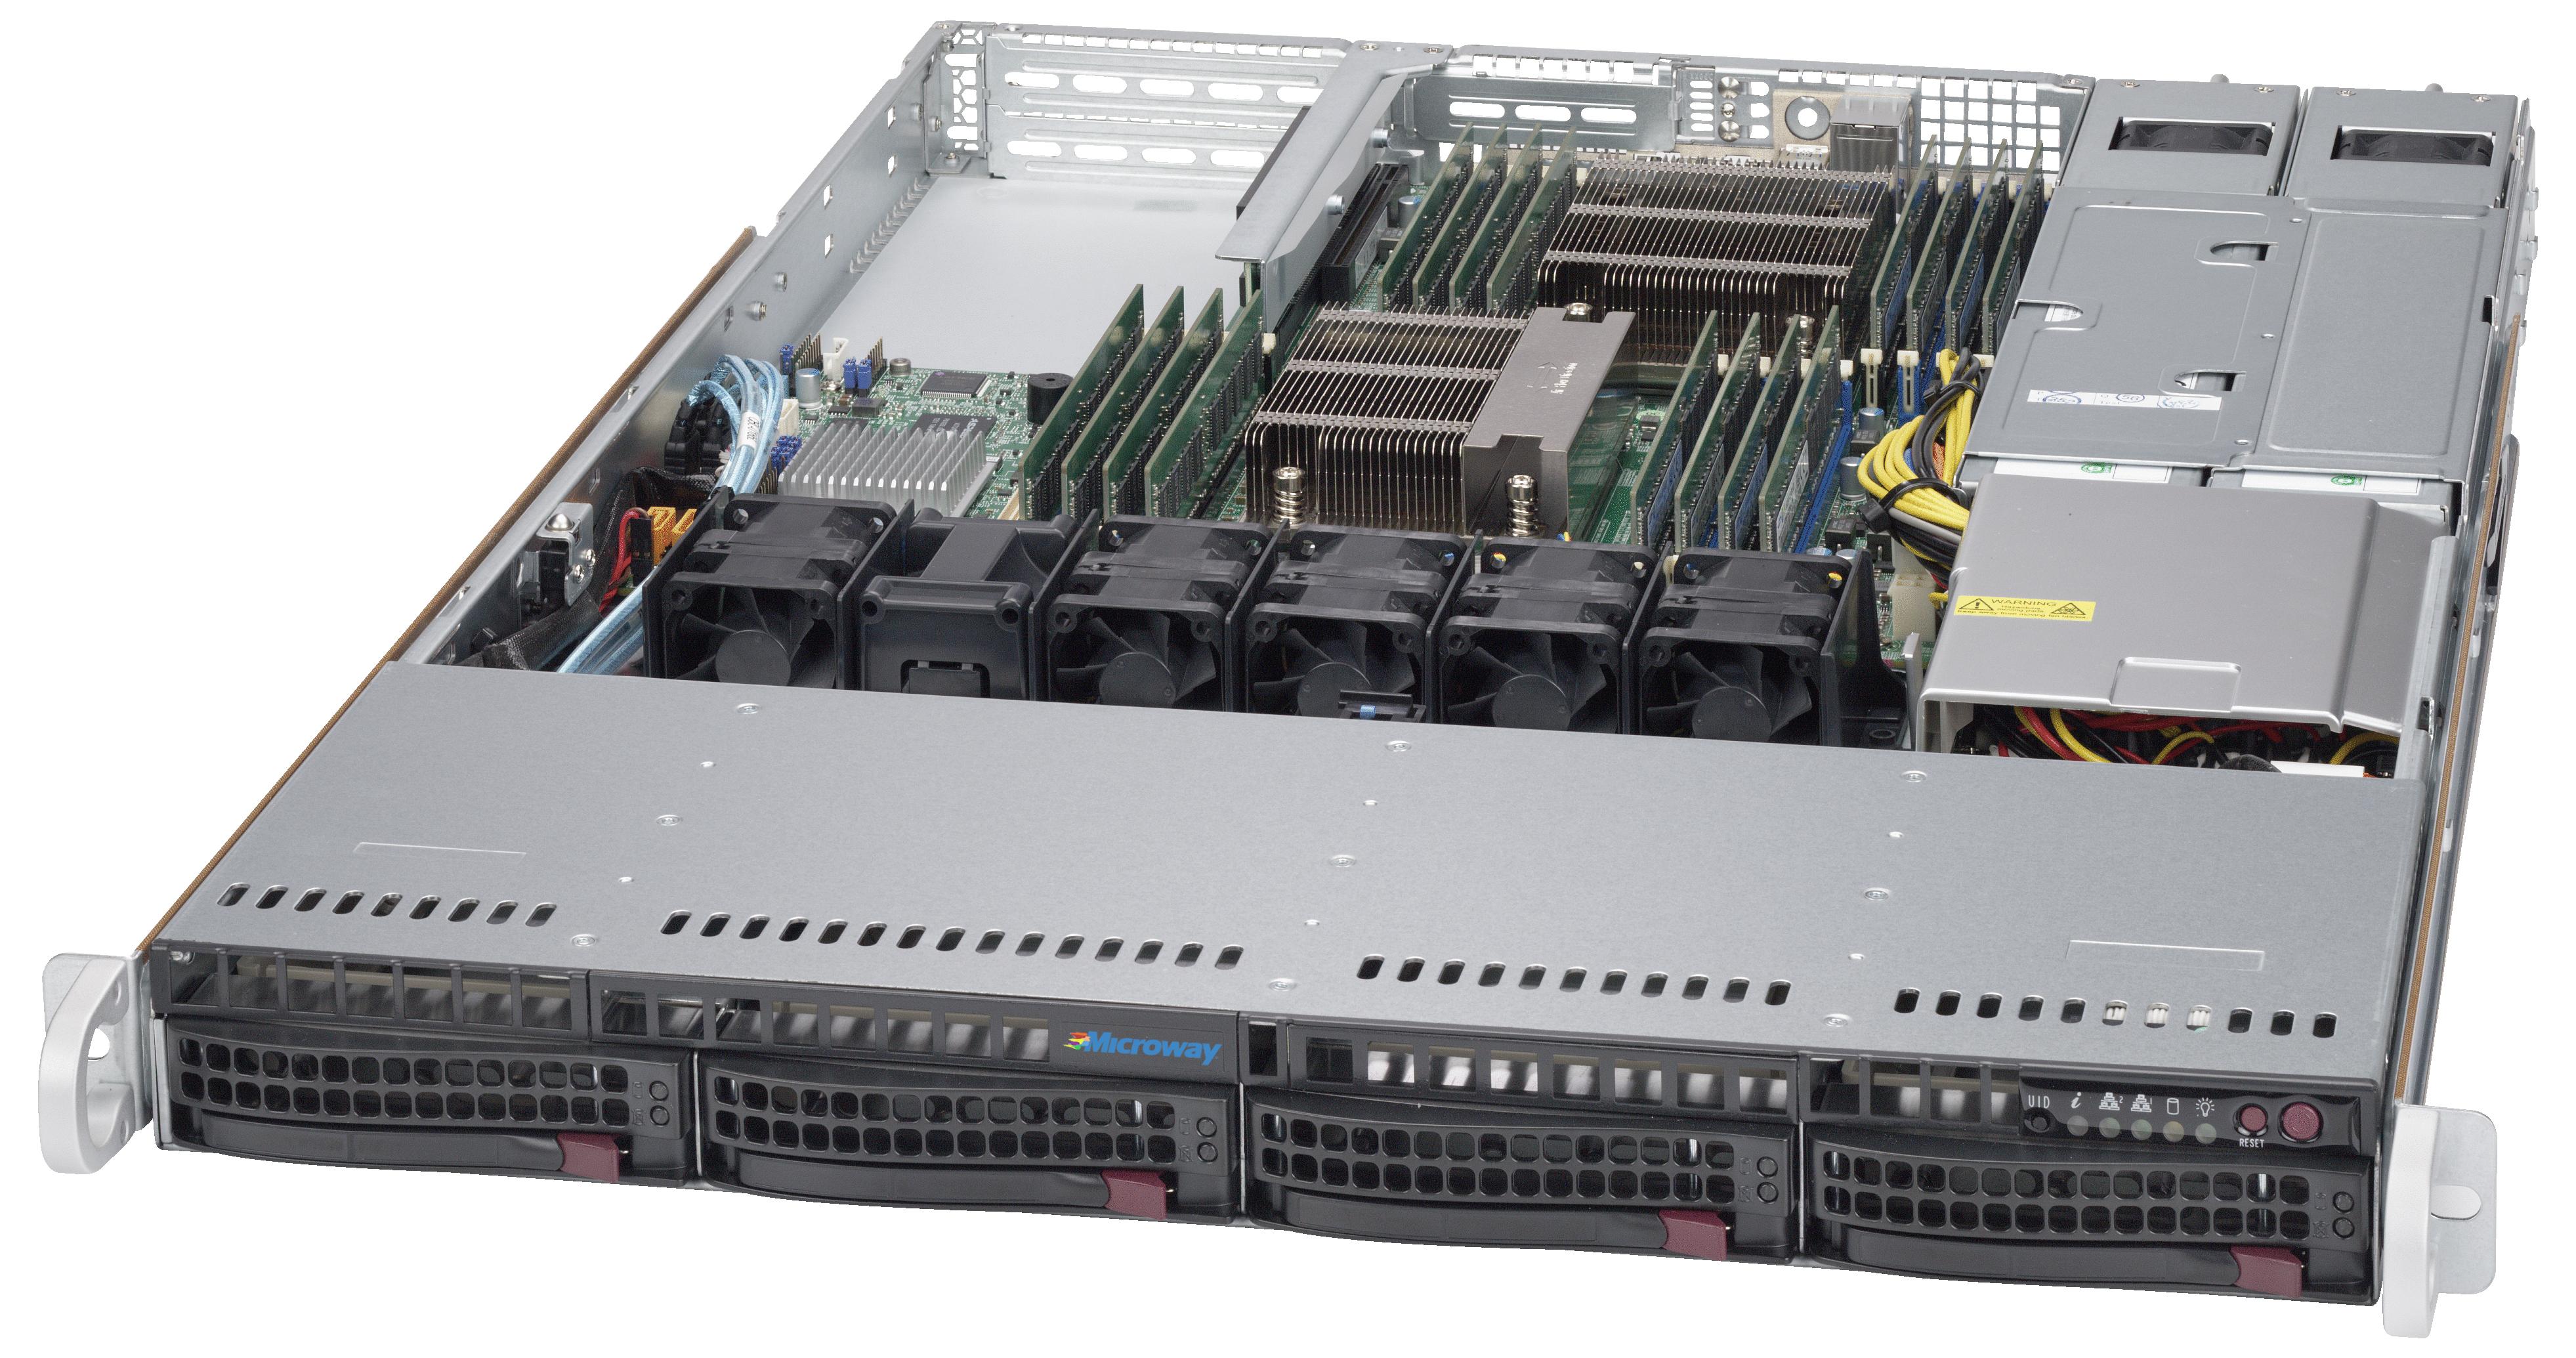 Microway Supermicro 1U Server - 6018R-WTRT   Microway